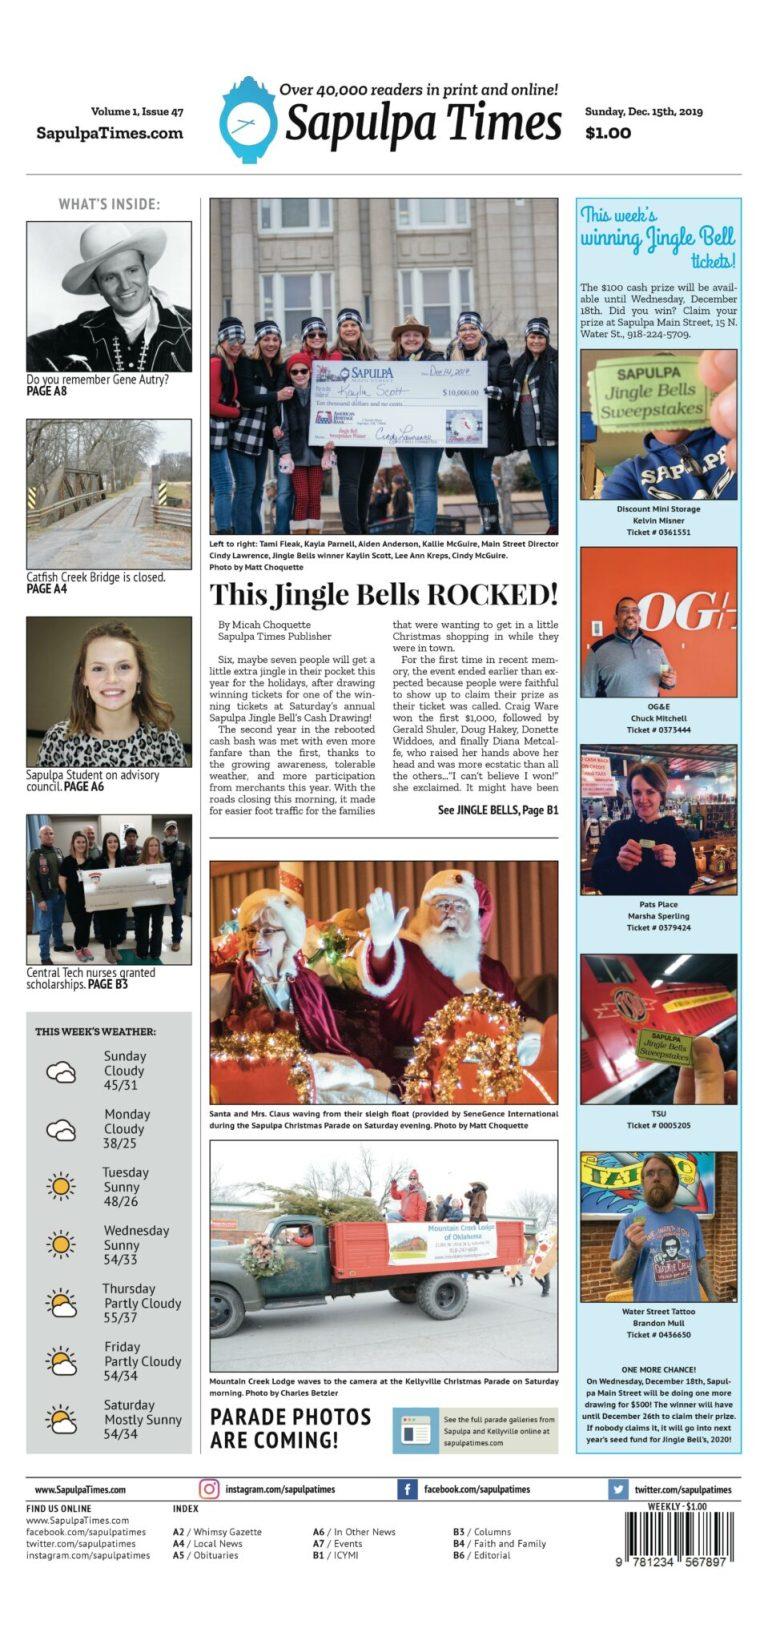 Sapulpa Times Digital Edition 12/15/2019